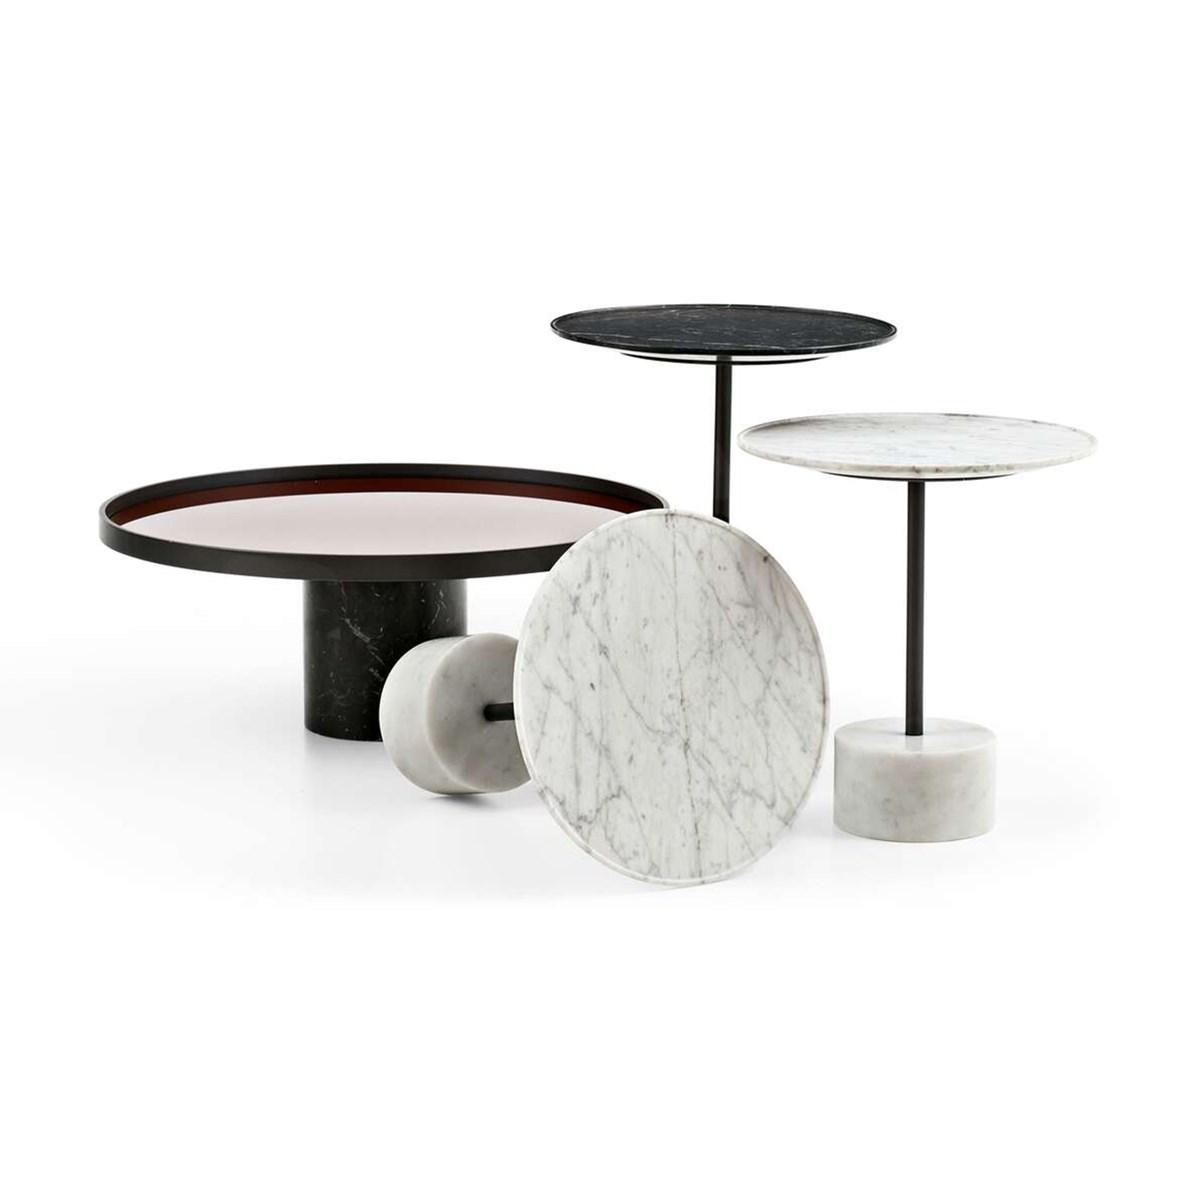 Cassina-Piero-Lissoni-9-Side-Table-Matisse-1 (1)